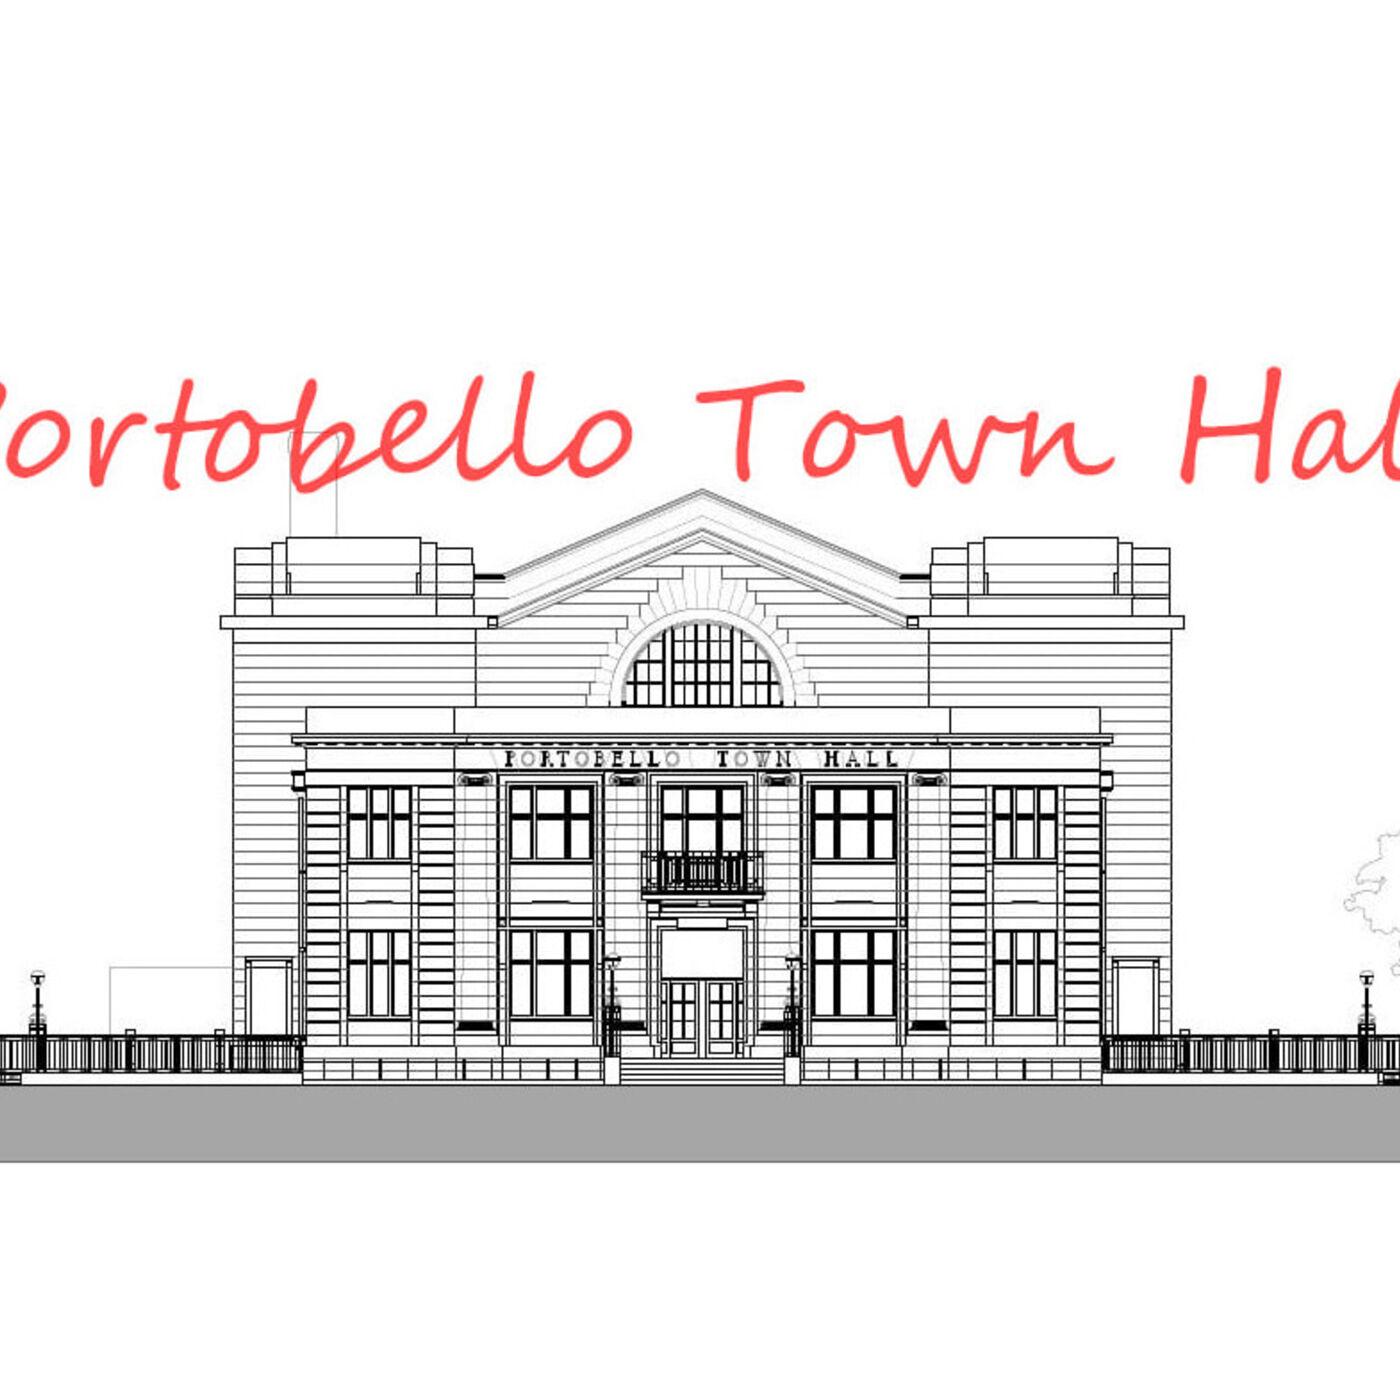 209 Portobello Town Hall - a Great Success Story